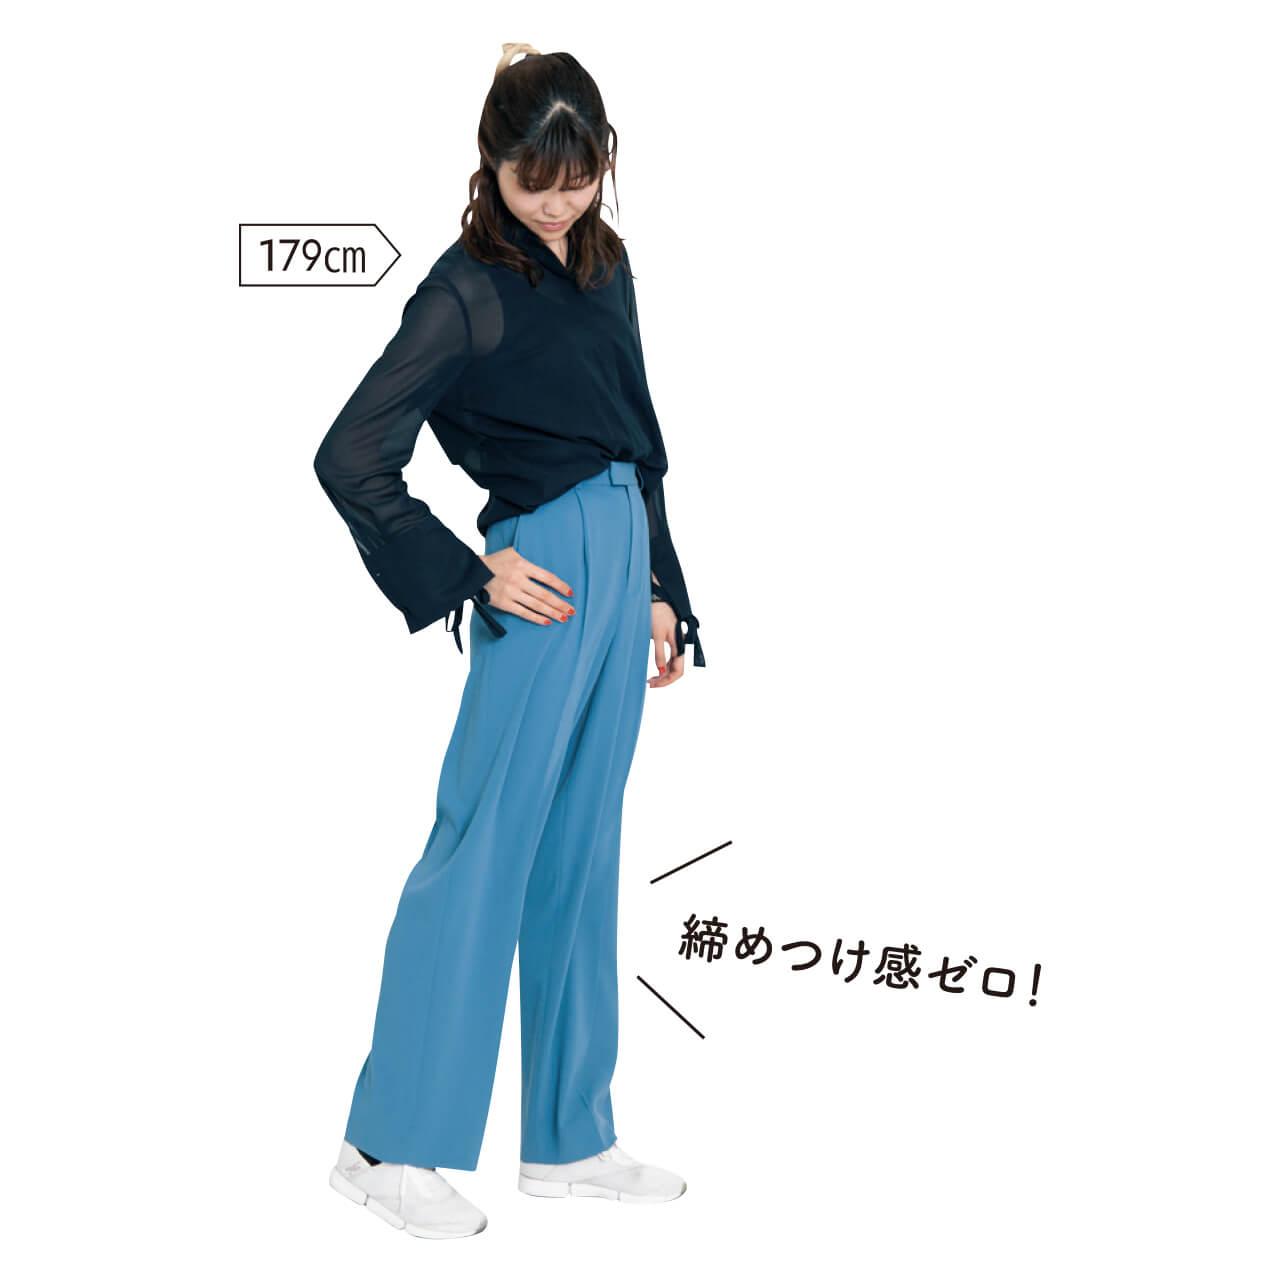 Editionの「ジョーゼットタックパンツ」を試着!179cm 編集カー子「締めつけ感ゼロ!」